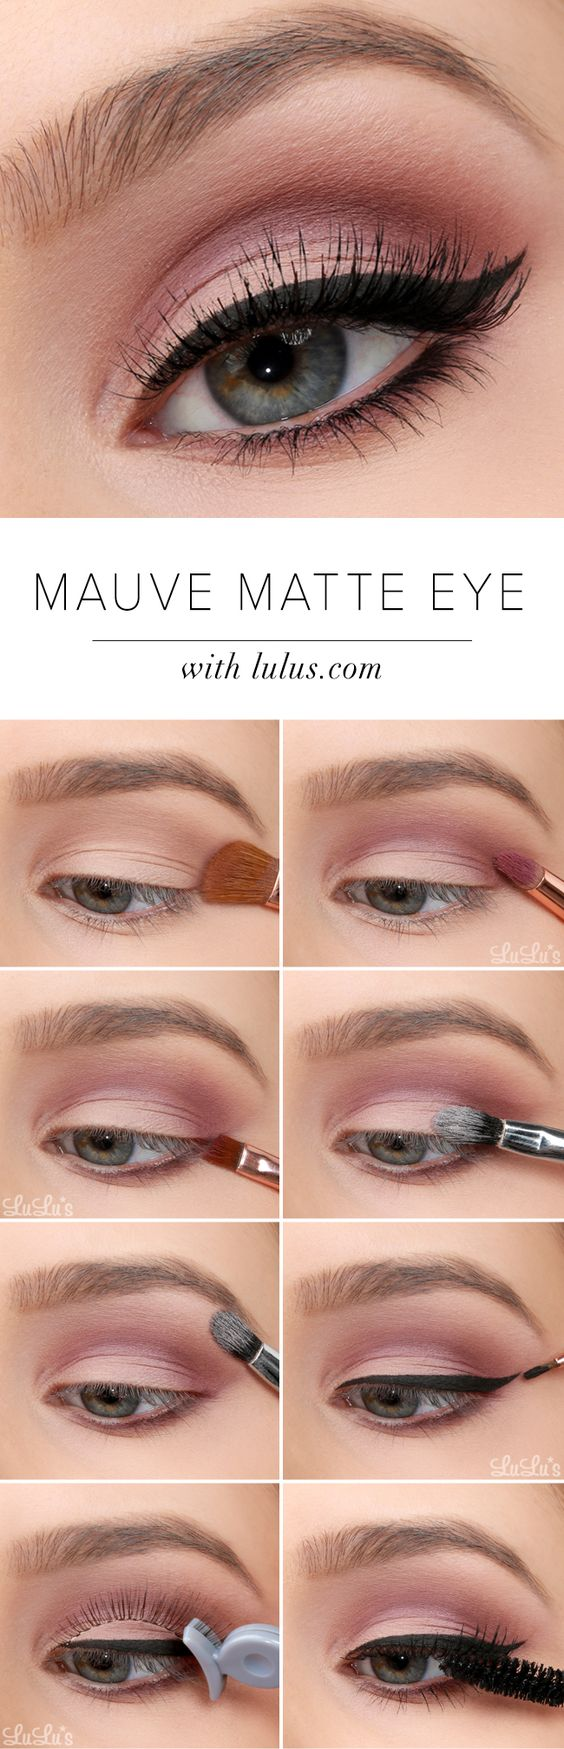 How to Rock Pink Eye Makeup (Tips, Ideas & Tutorials ) - Pretty